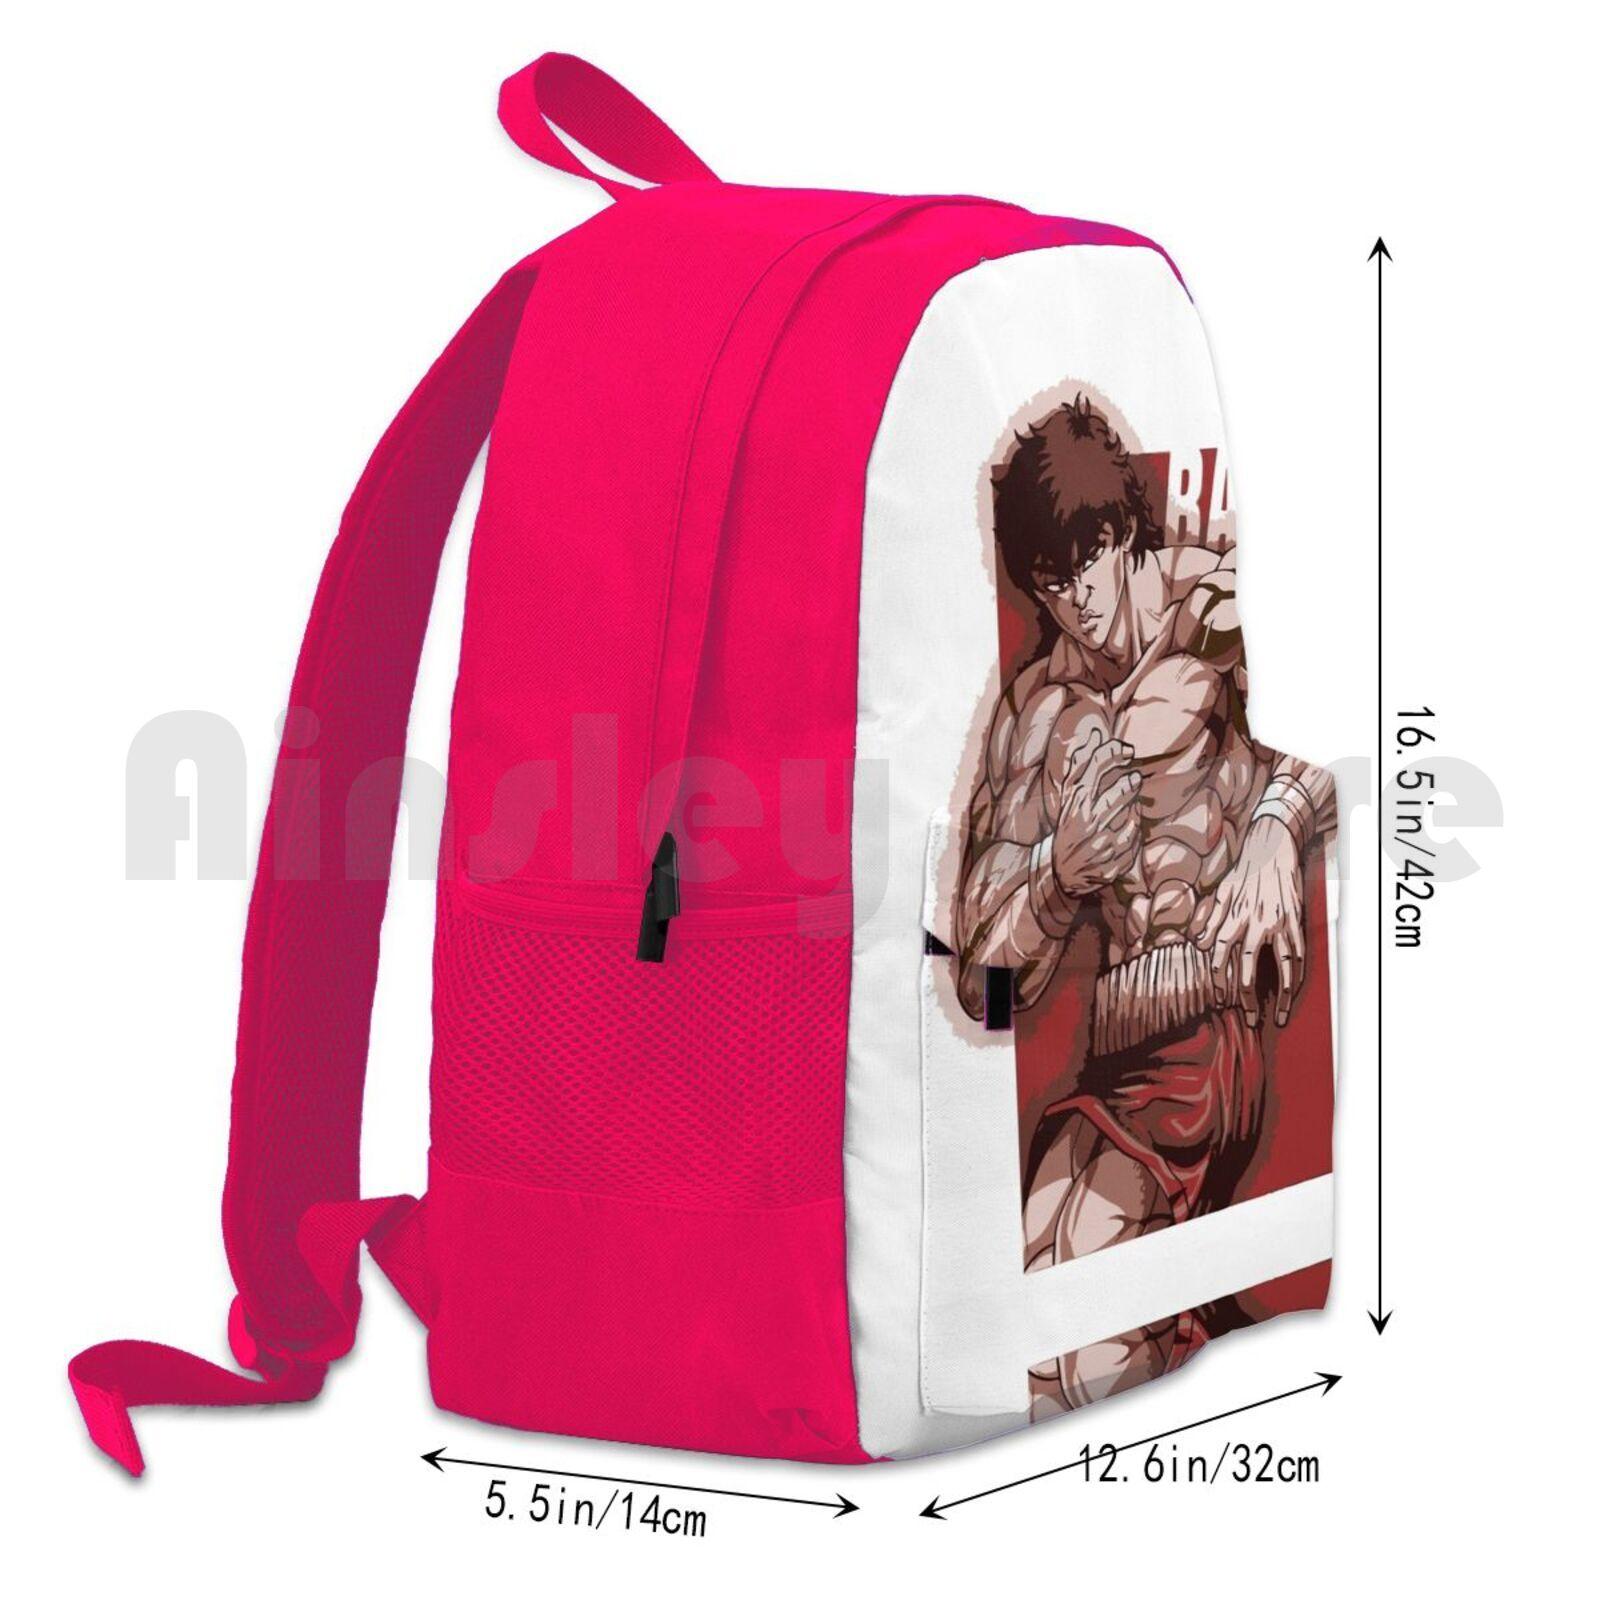 H0a619771c3f8426184ba630c95de547a2 - Anime Backpacks